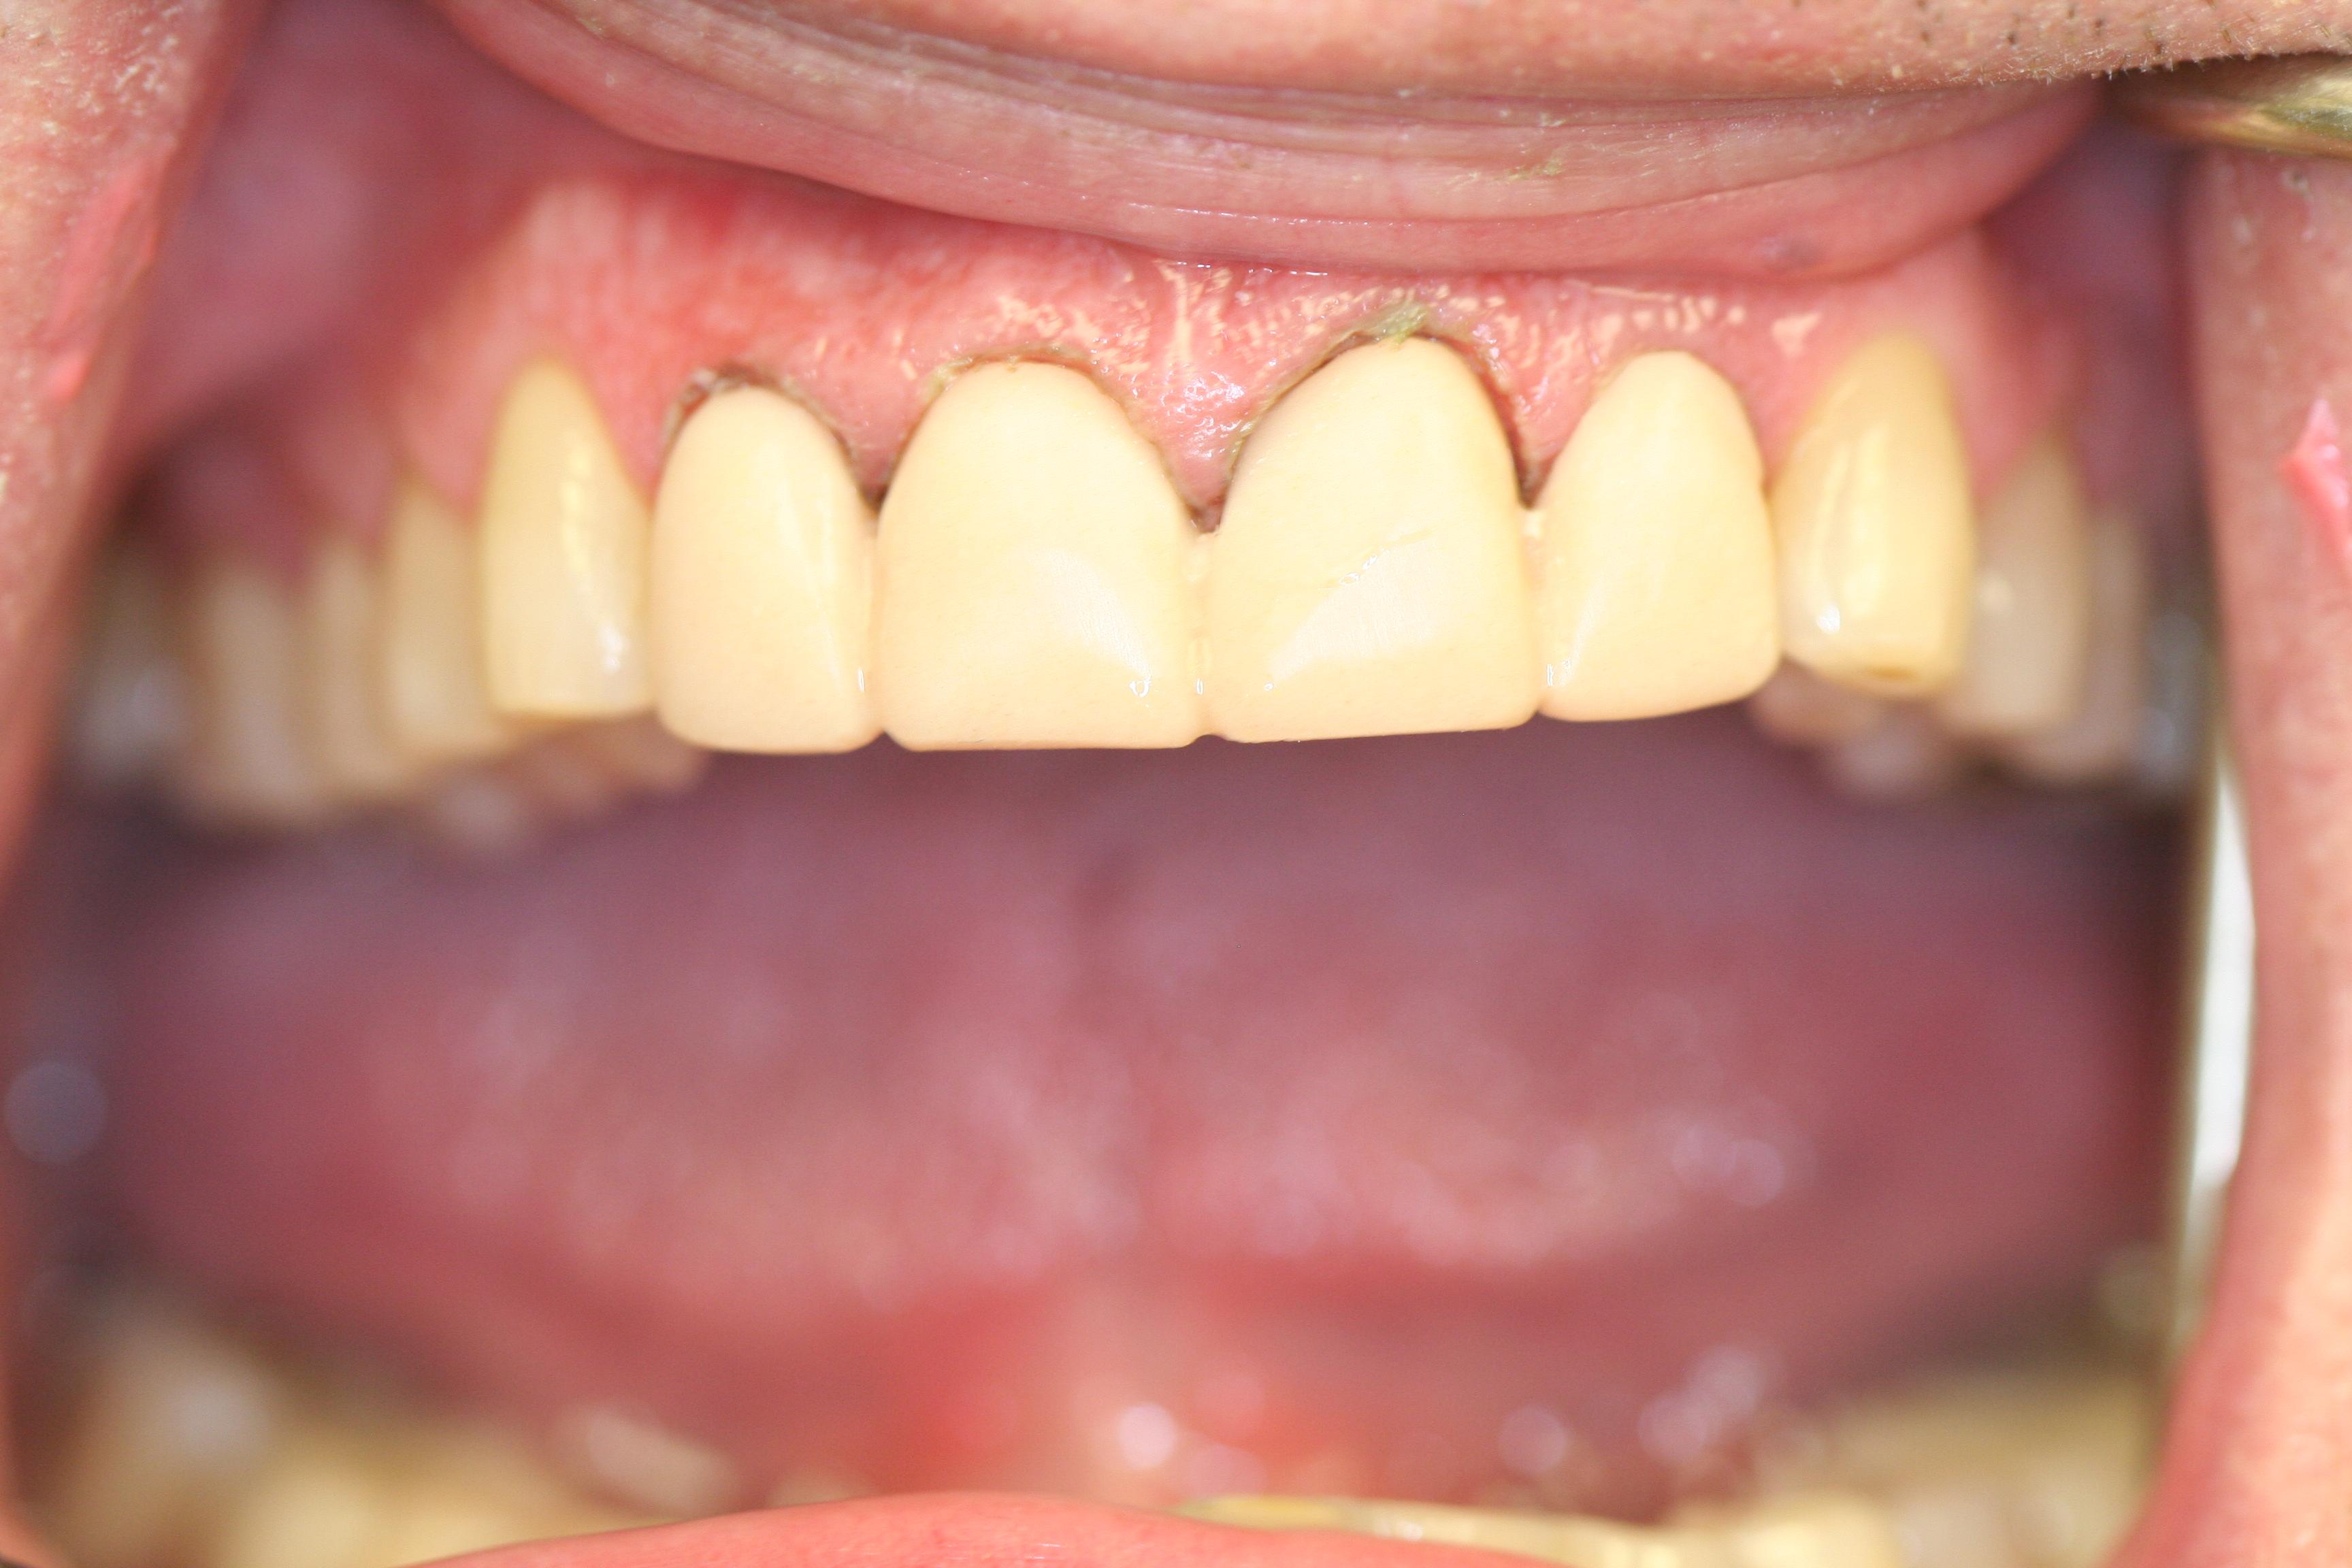 Boynton Dentist East Boynton Dental Mitchell Indictor Dentist